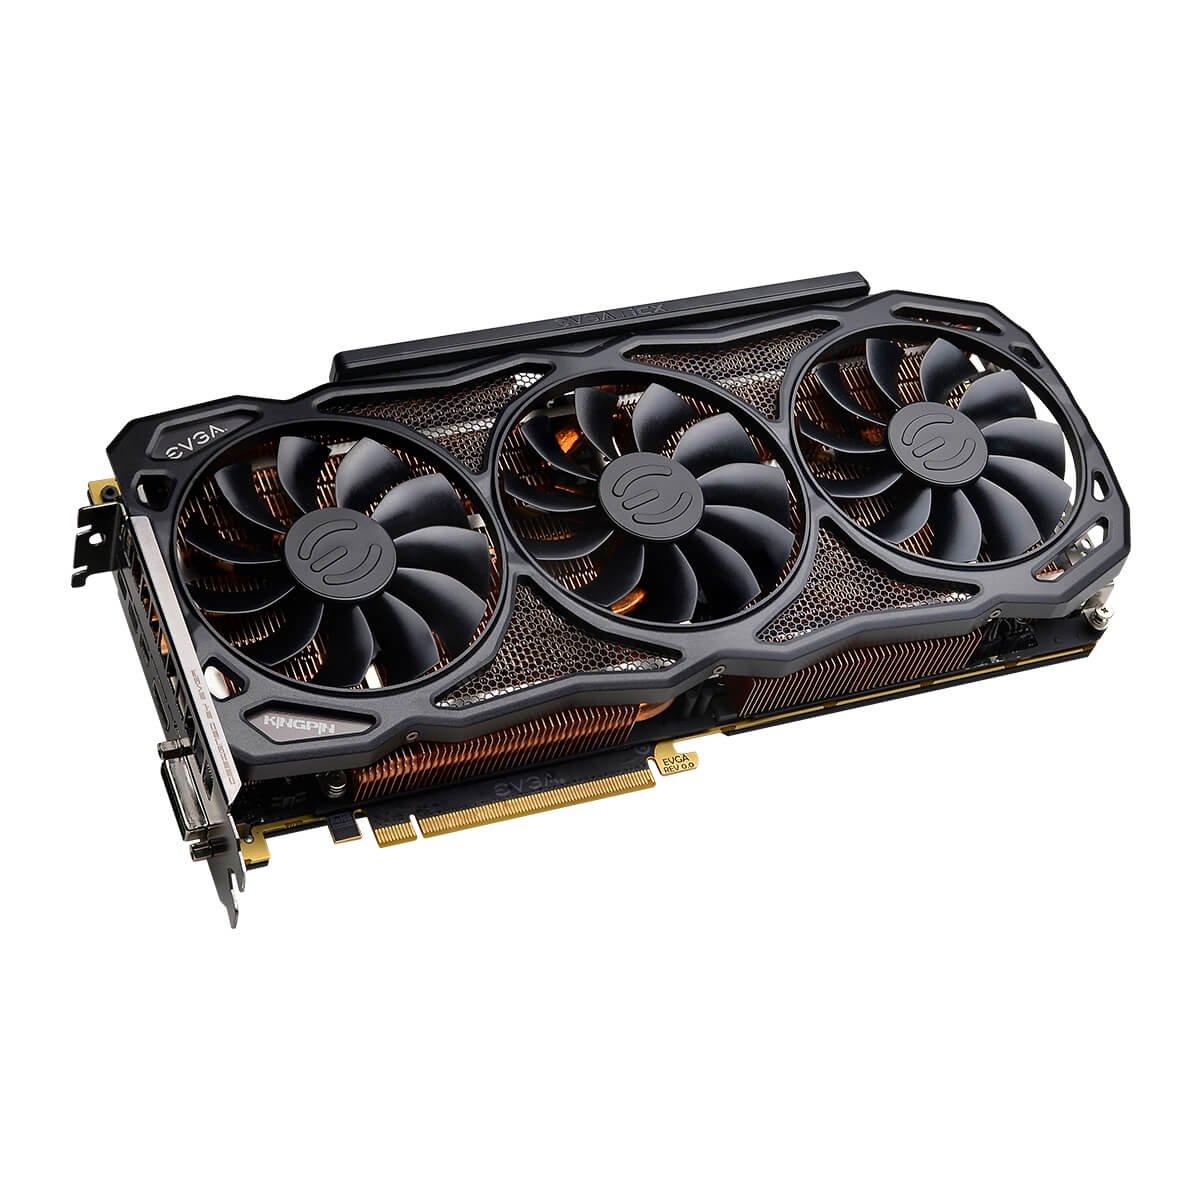 EVGA GeForce GTX 1080 Ti K | NGP | N Gaming 11GB GDDR5X Tecnología iCX - 9 sensores térmicos y LED RGB G / P / M Tarjetas gráficas 11G-P4-6798-KR: ...